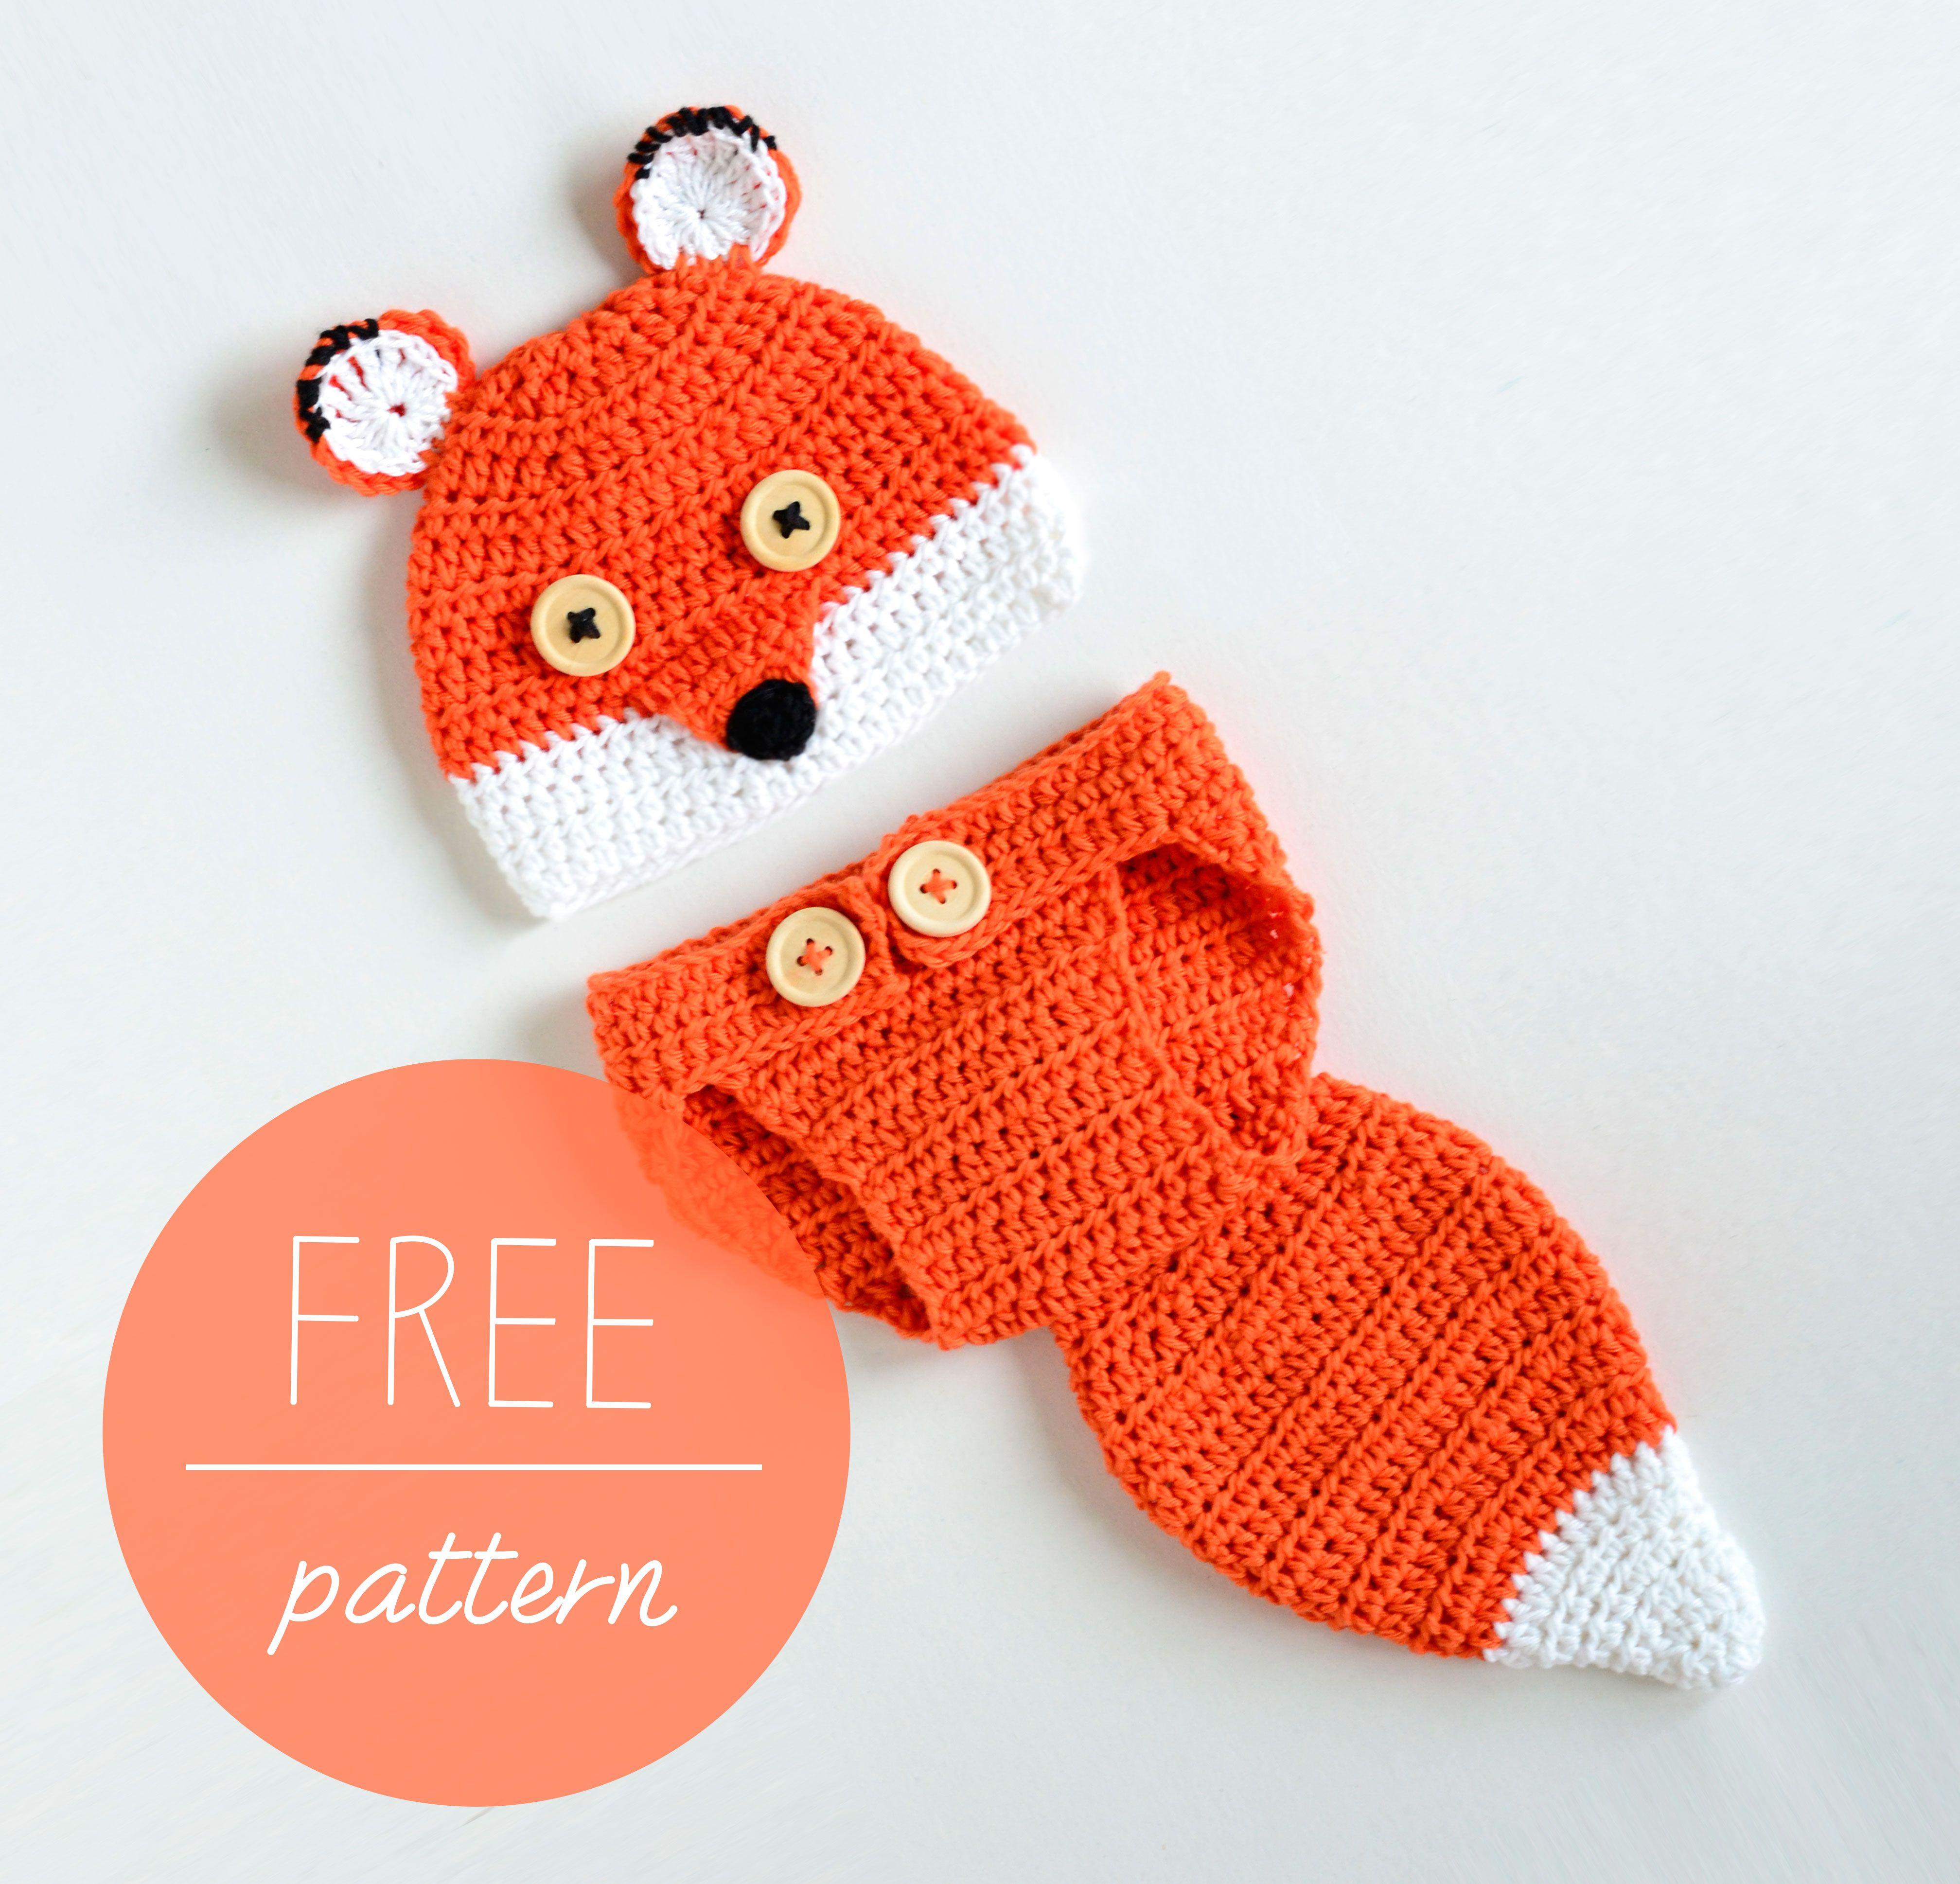 10 crochet fox patterns crocheted baby hats baby hats and 10 crochet fox patterns crochet baby hatscrochet bankloansurffo Choice Image